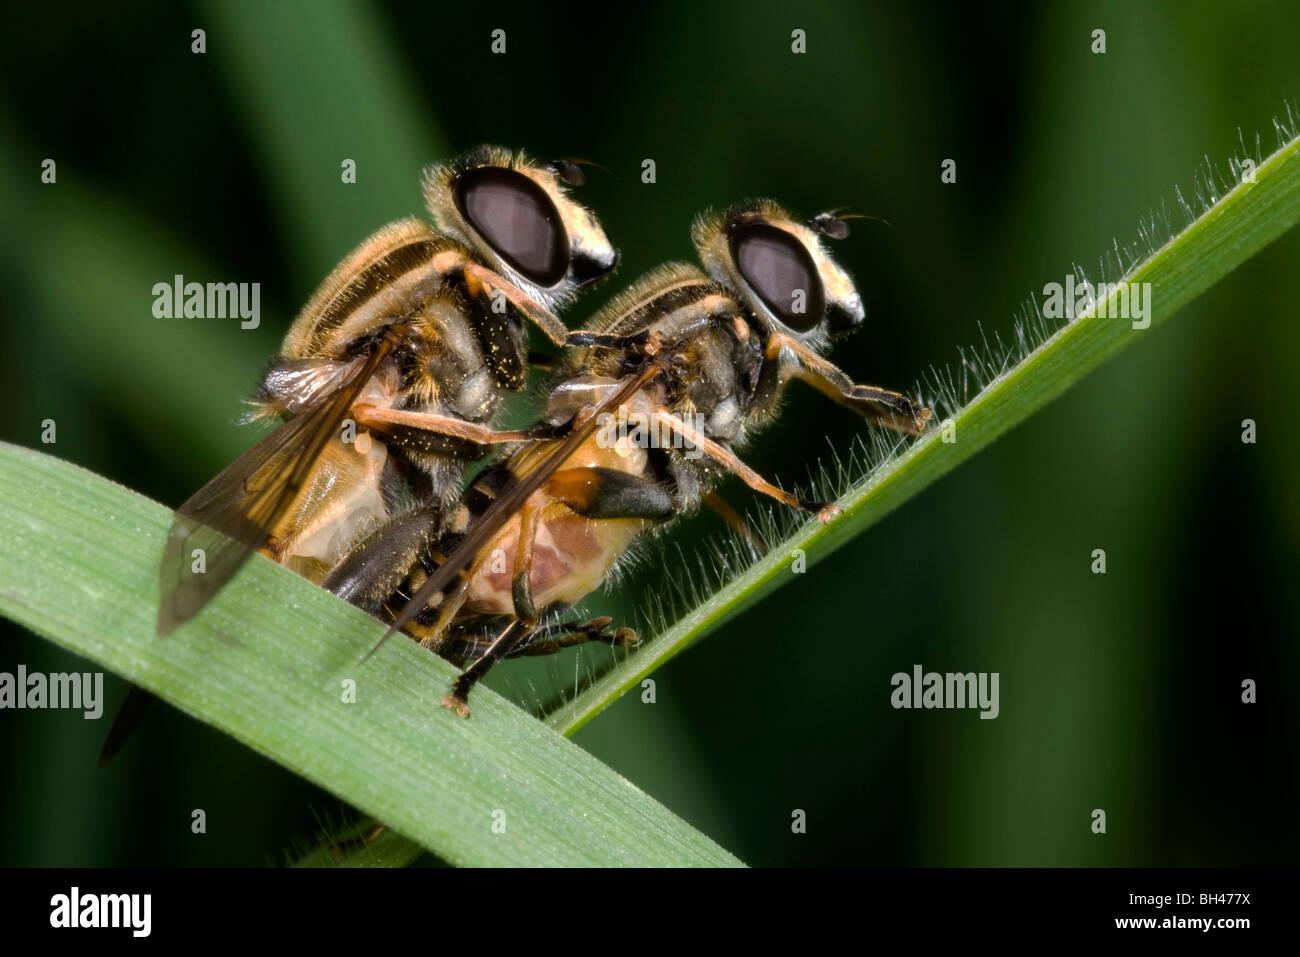 Sirfide (Helophilus pendulus). Par de acoplamiento sobre el césped del tallo en hábitat pantanoso. Foto de stock